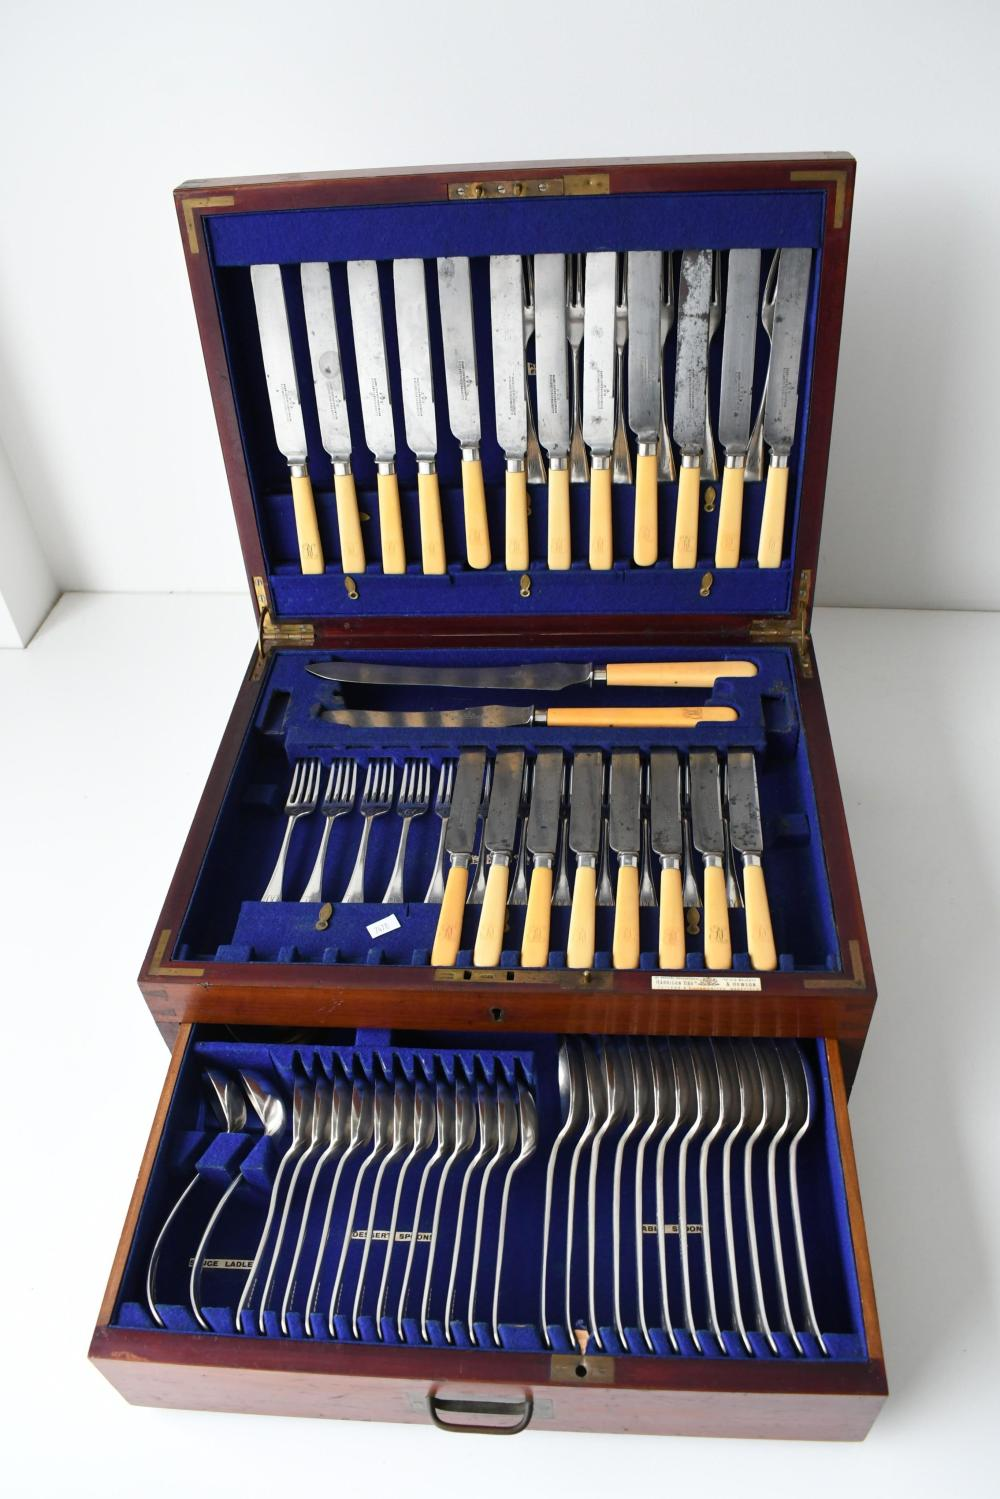 Antique cutlery canteen & cutlery canteen 18 x 35.50 x 45.50 cm. (7.09 x 13.98 x 17.91 in.)